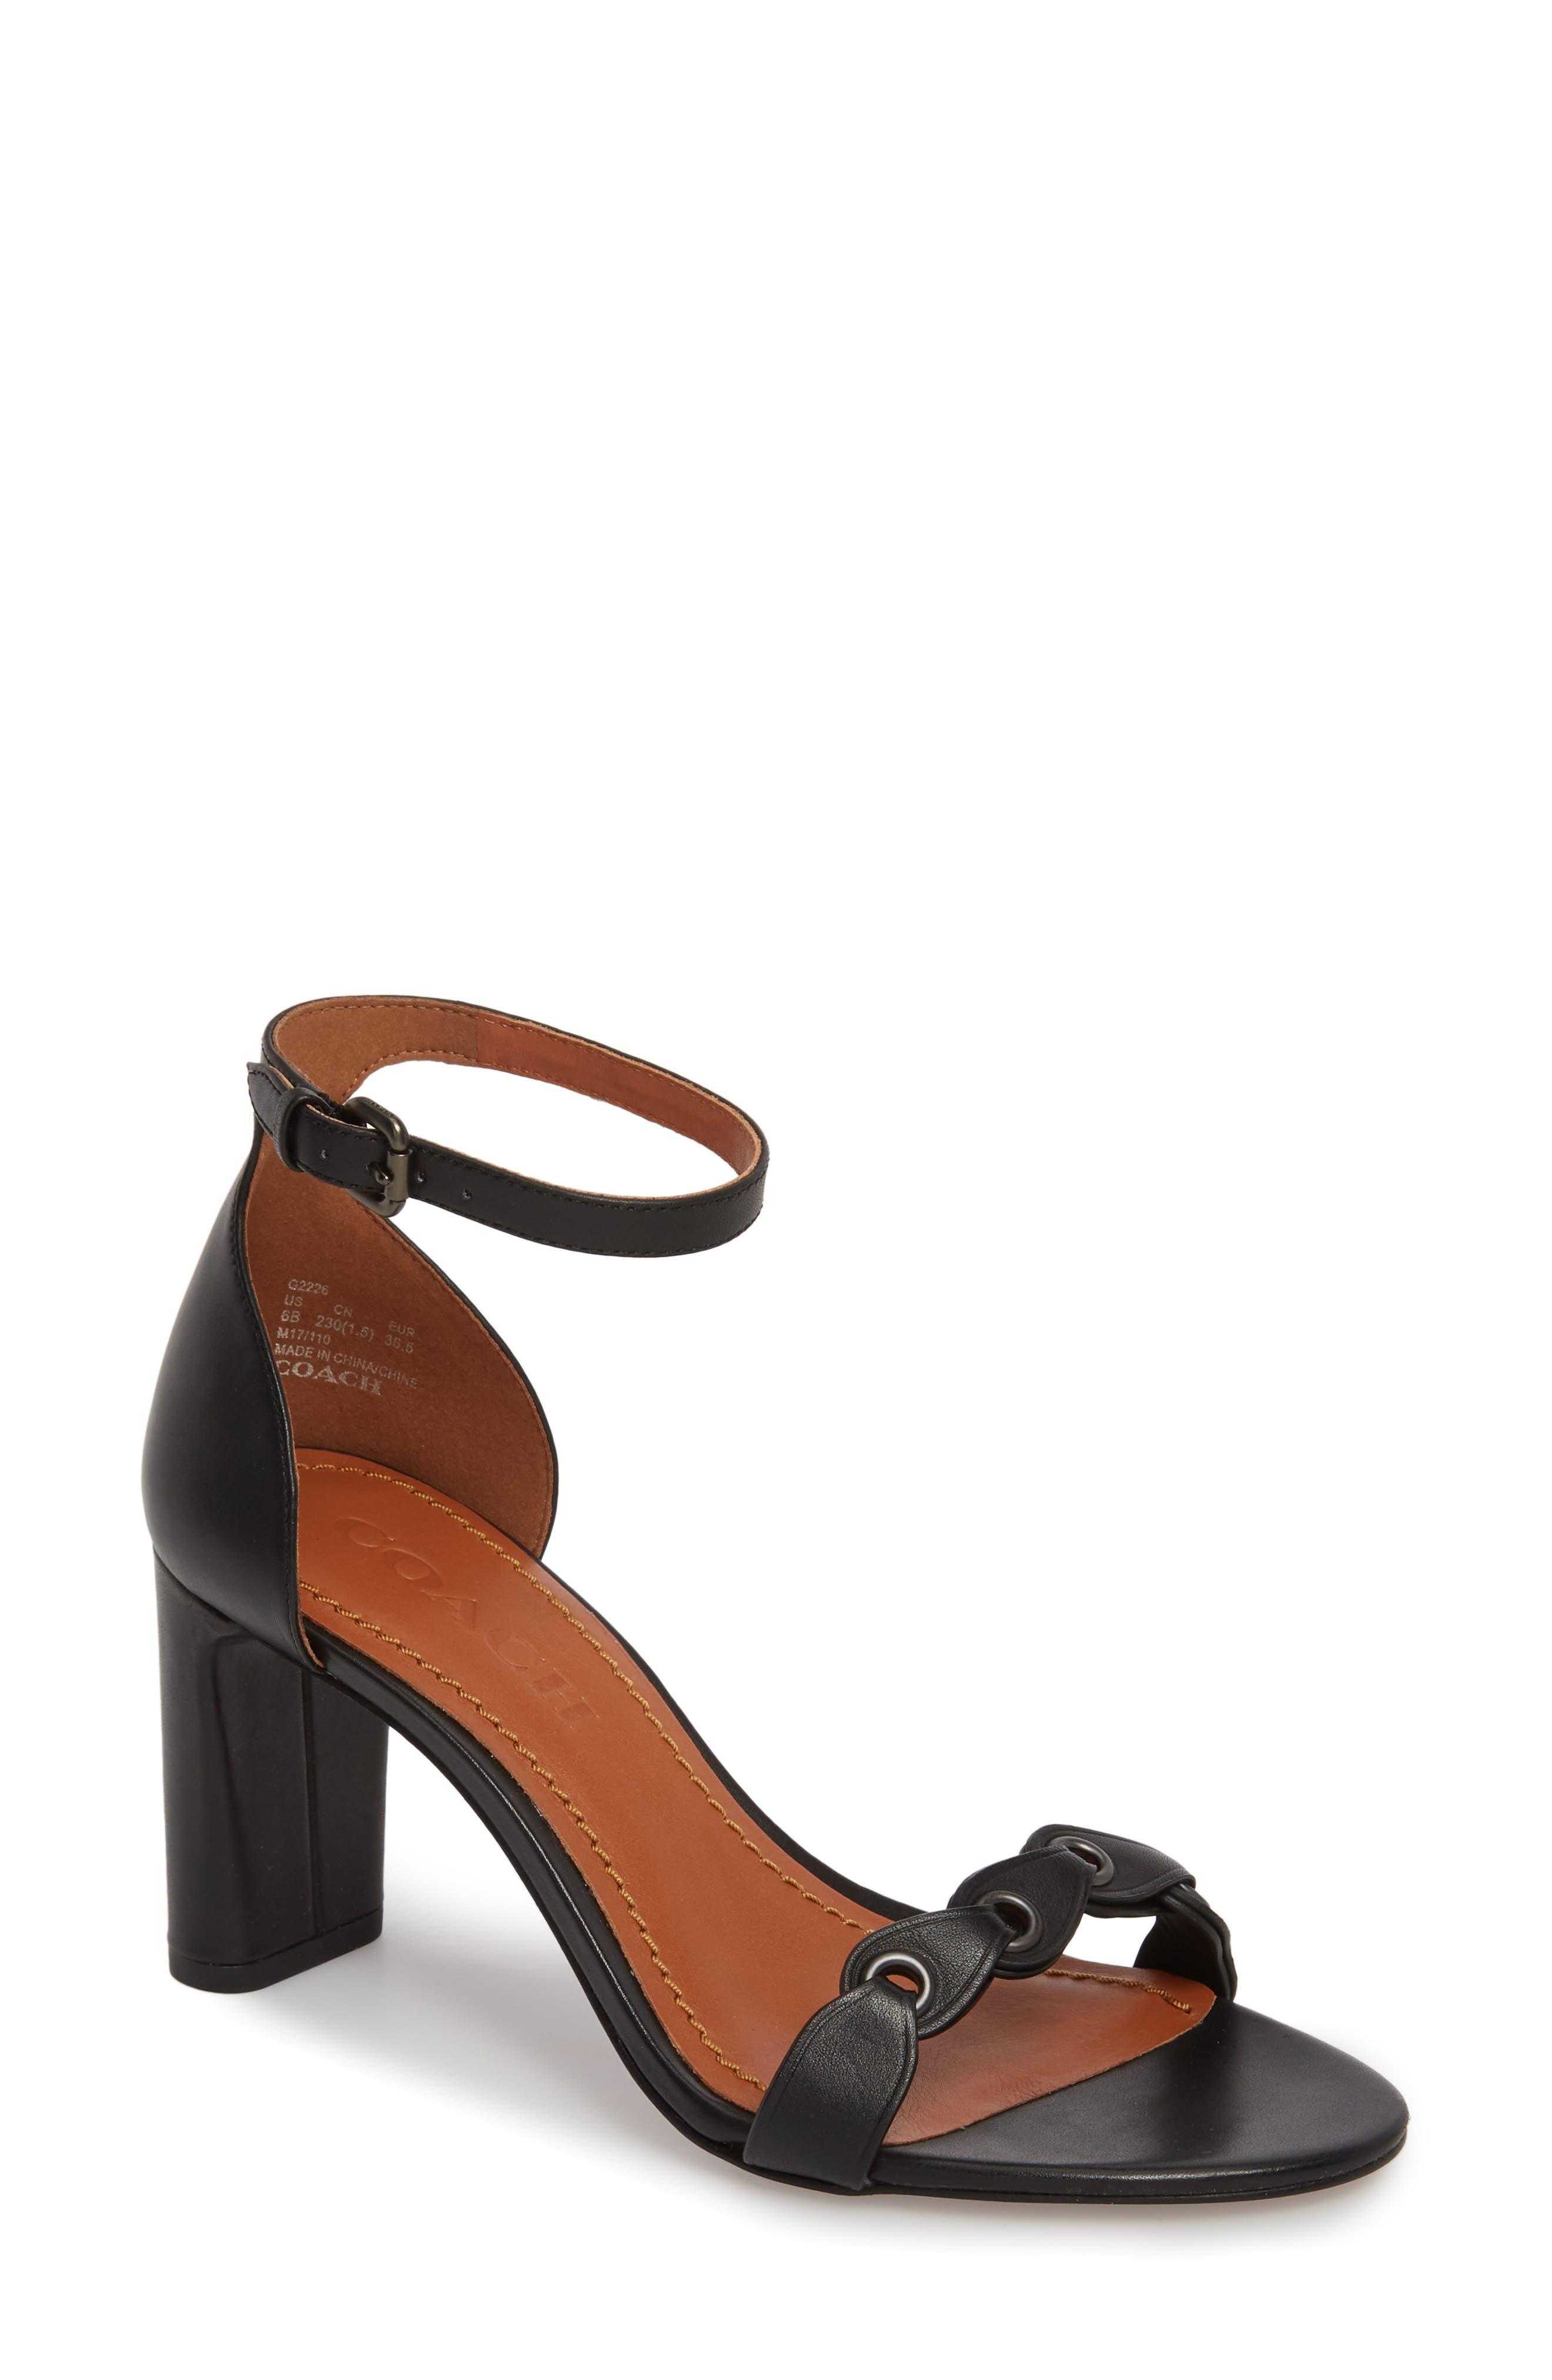 Link Ankle Strap Sandal,                             Main thumbnail 1, color,